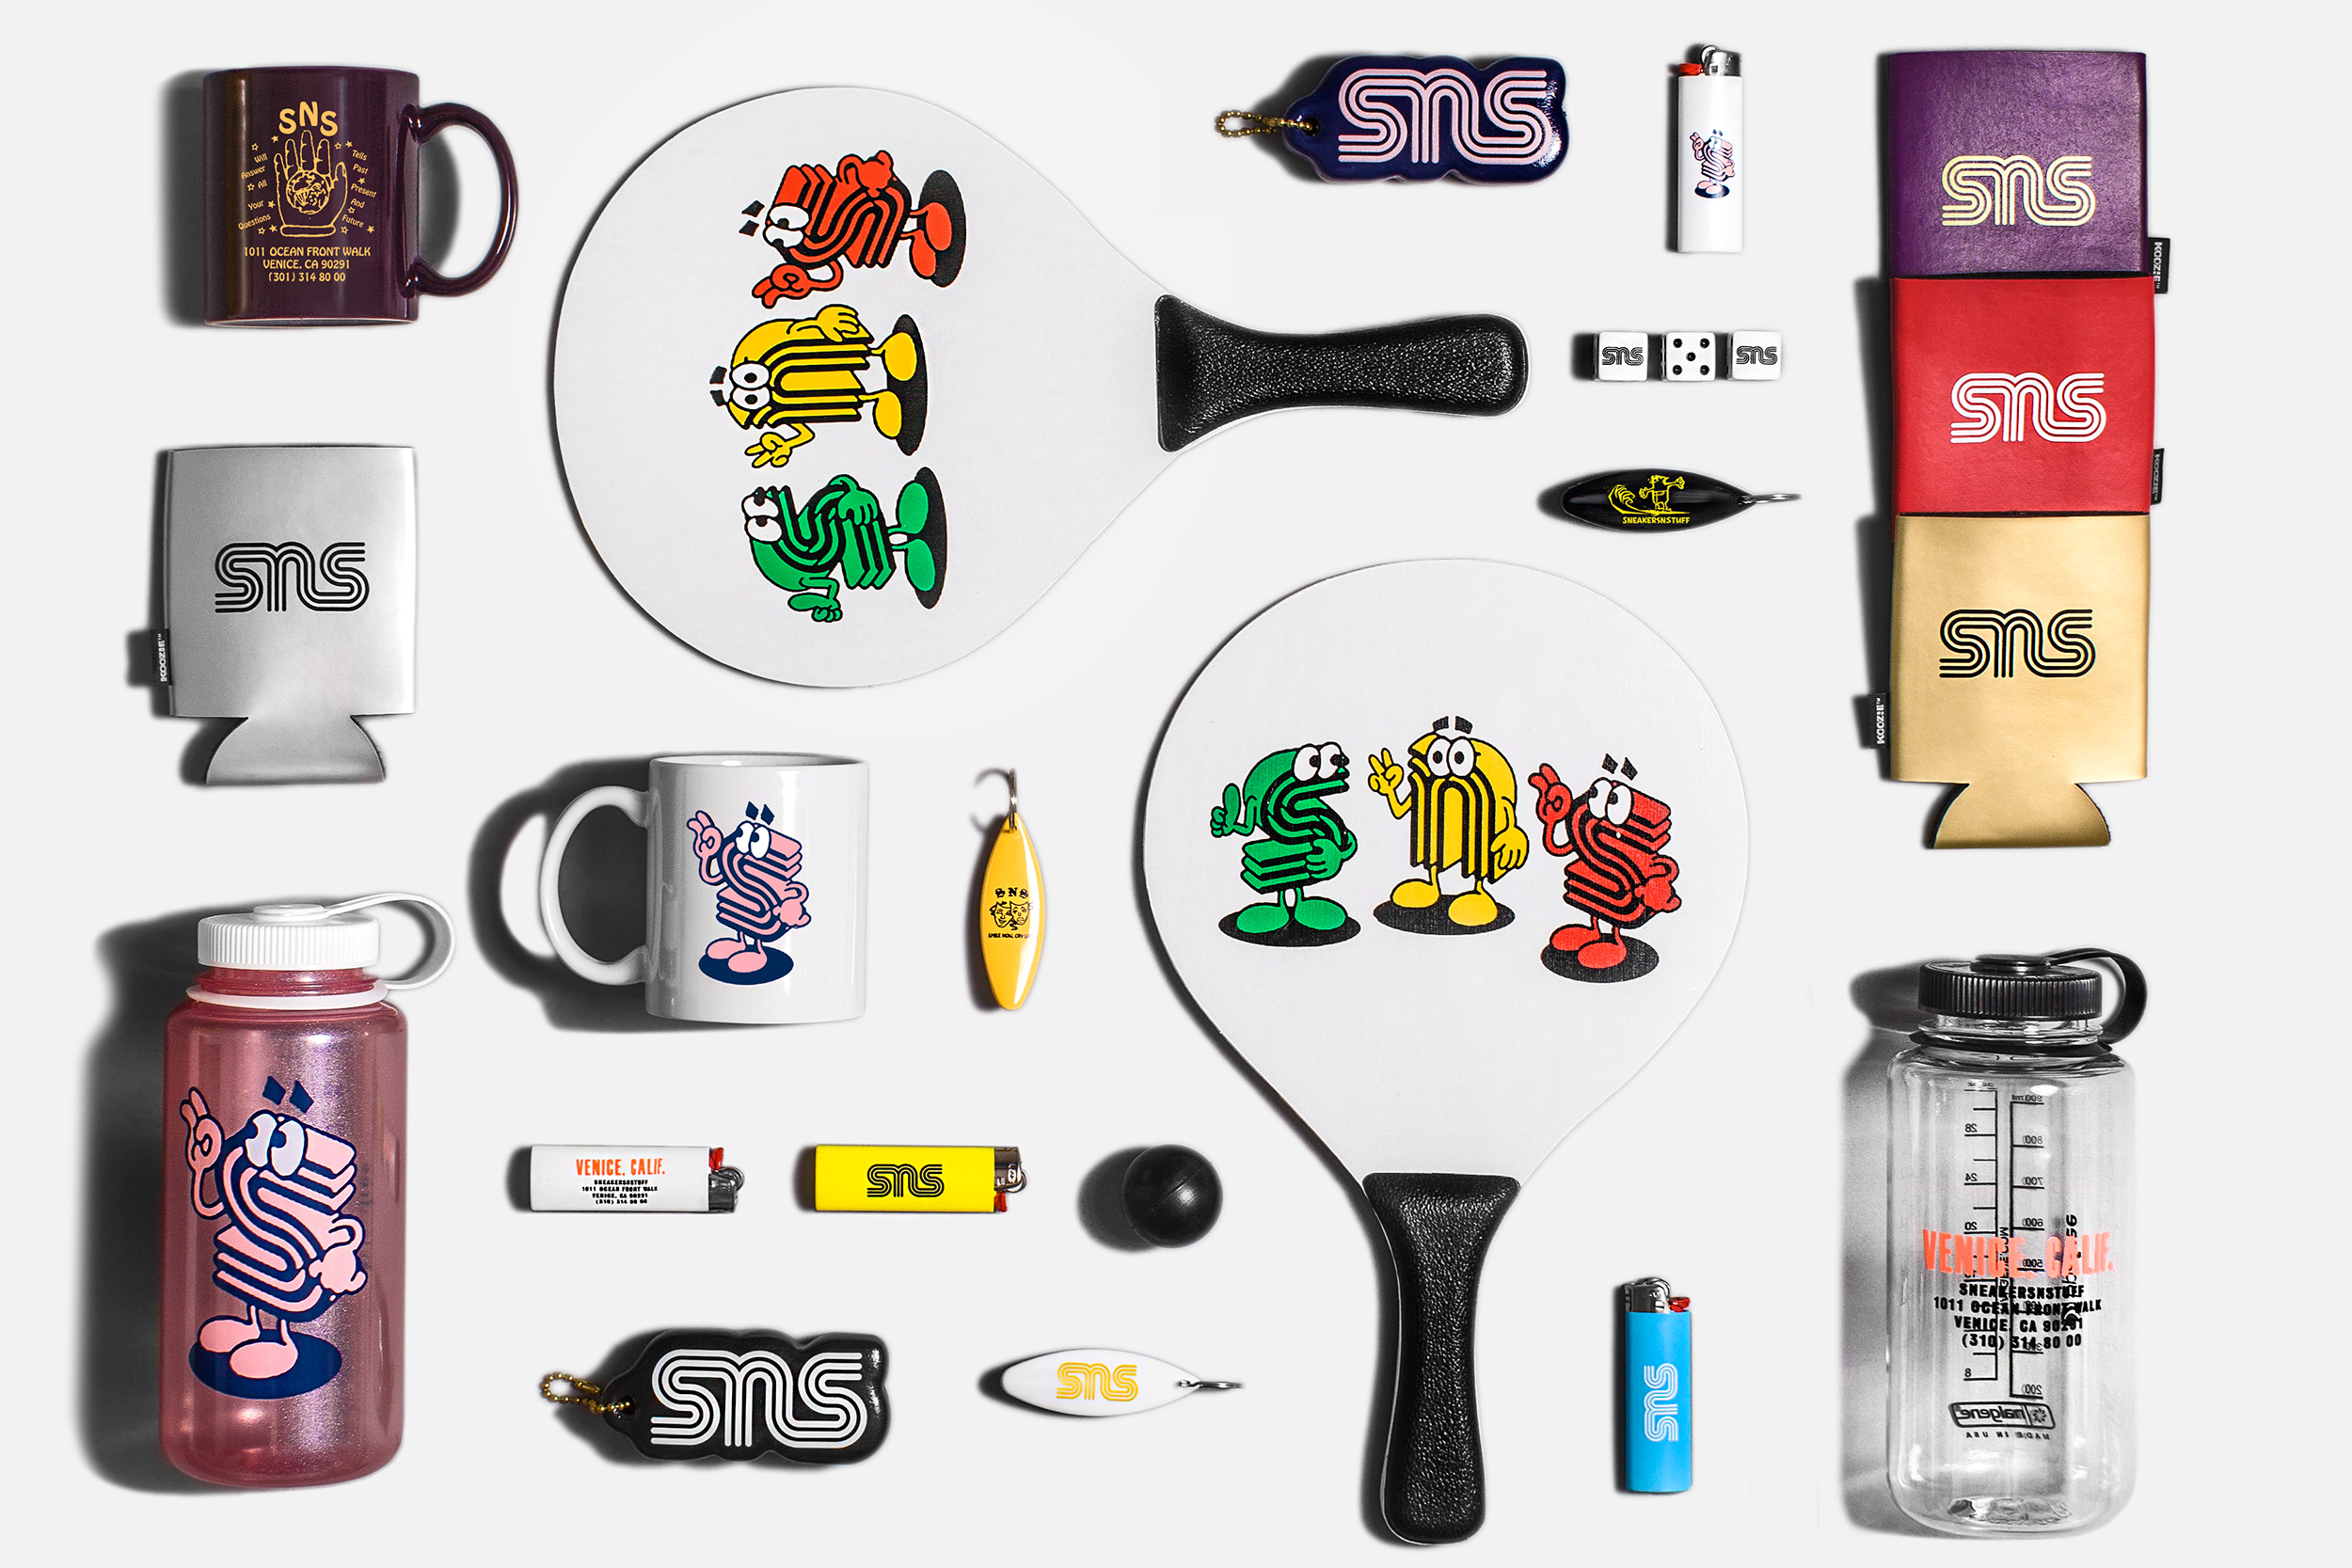 SNS-1.jpg